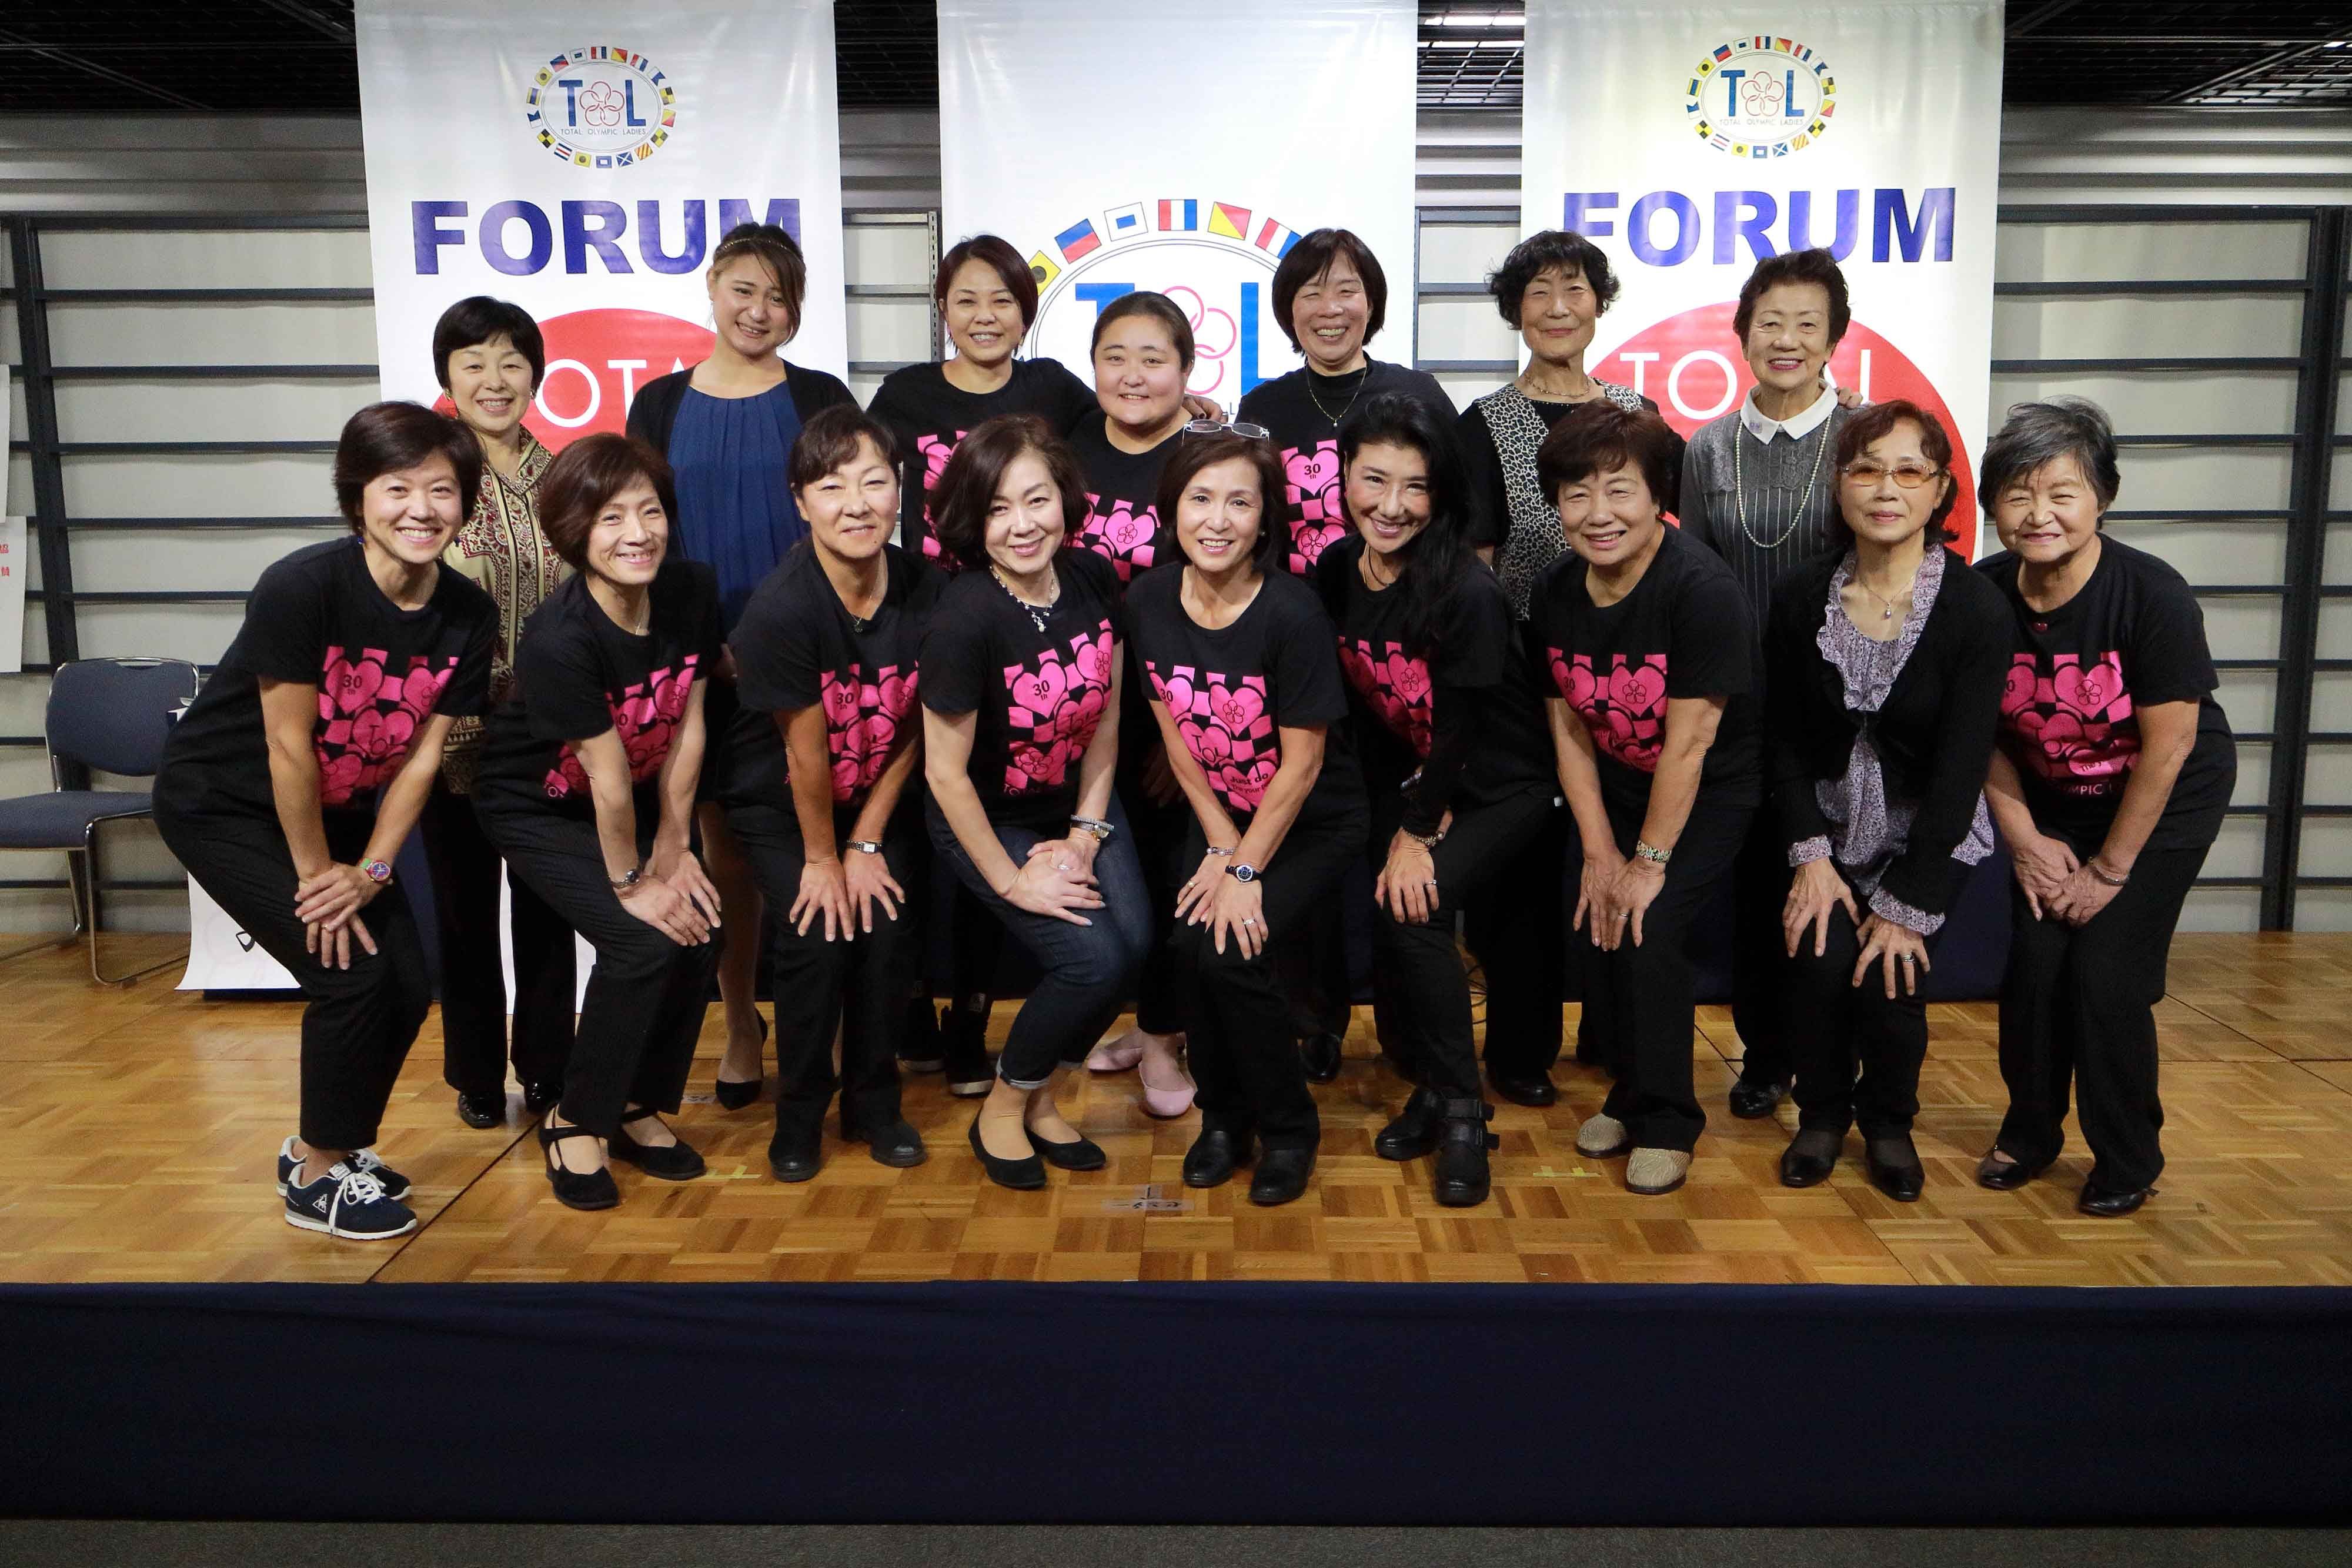 TOL/トータル・オリンピック・レディス会2016総会